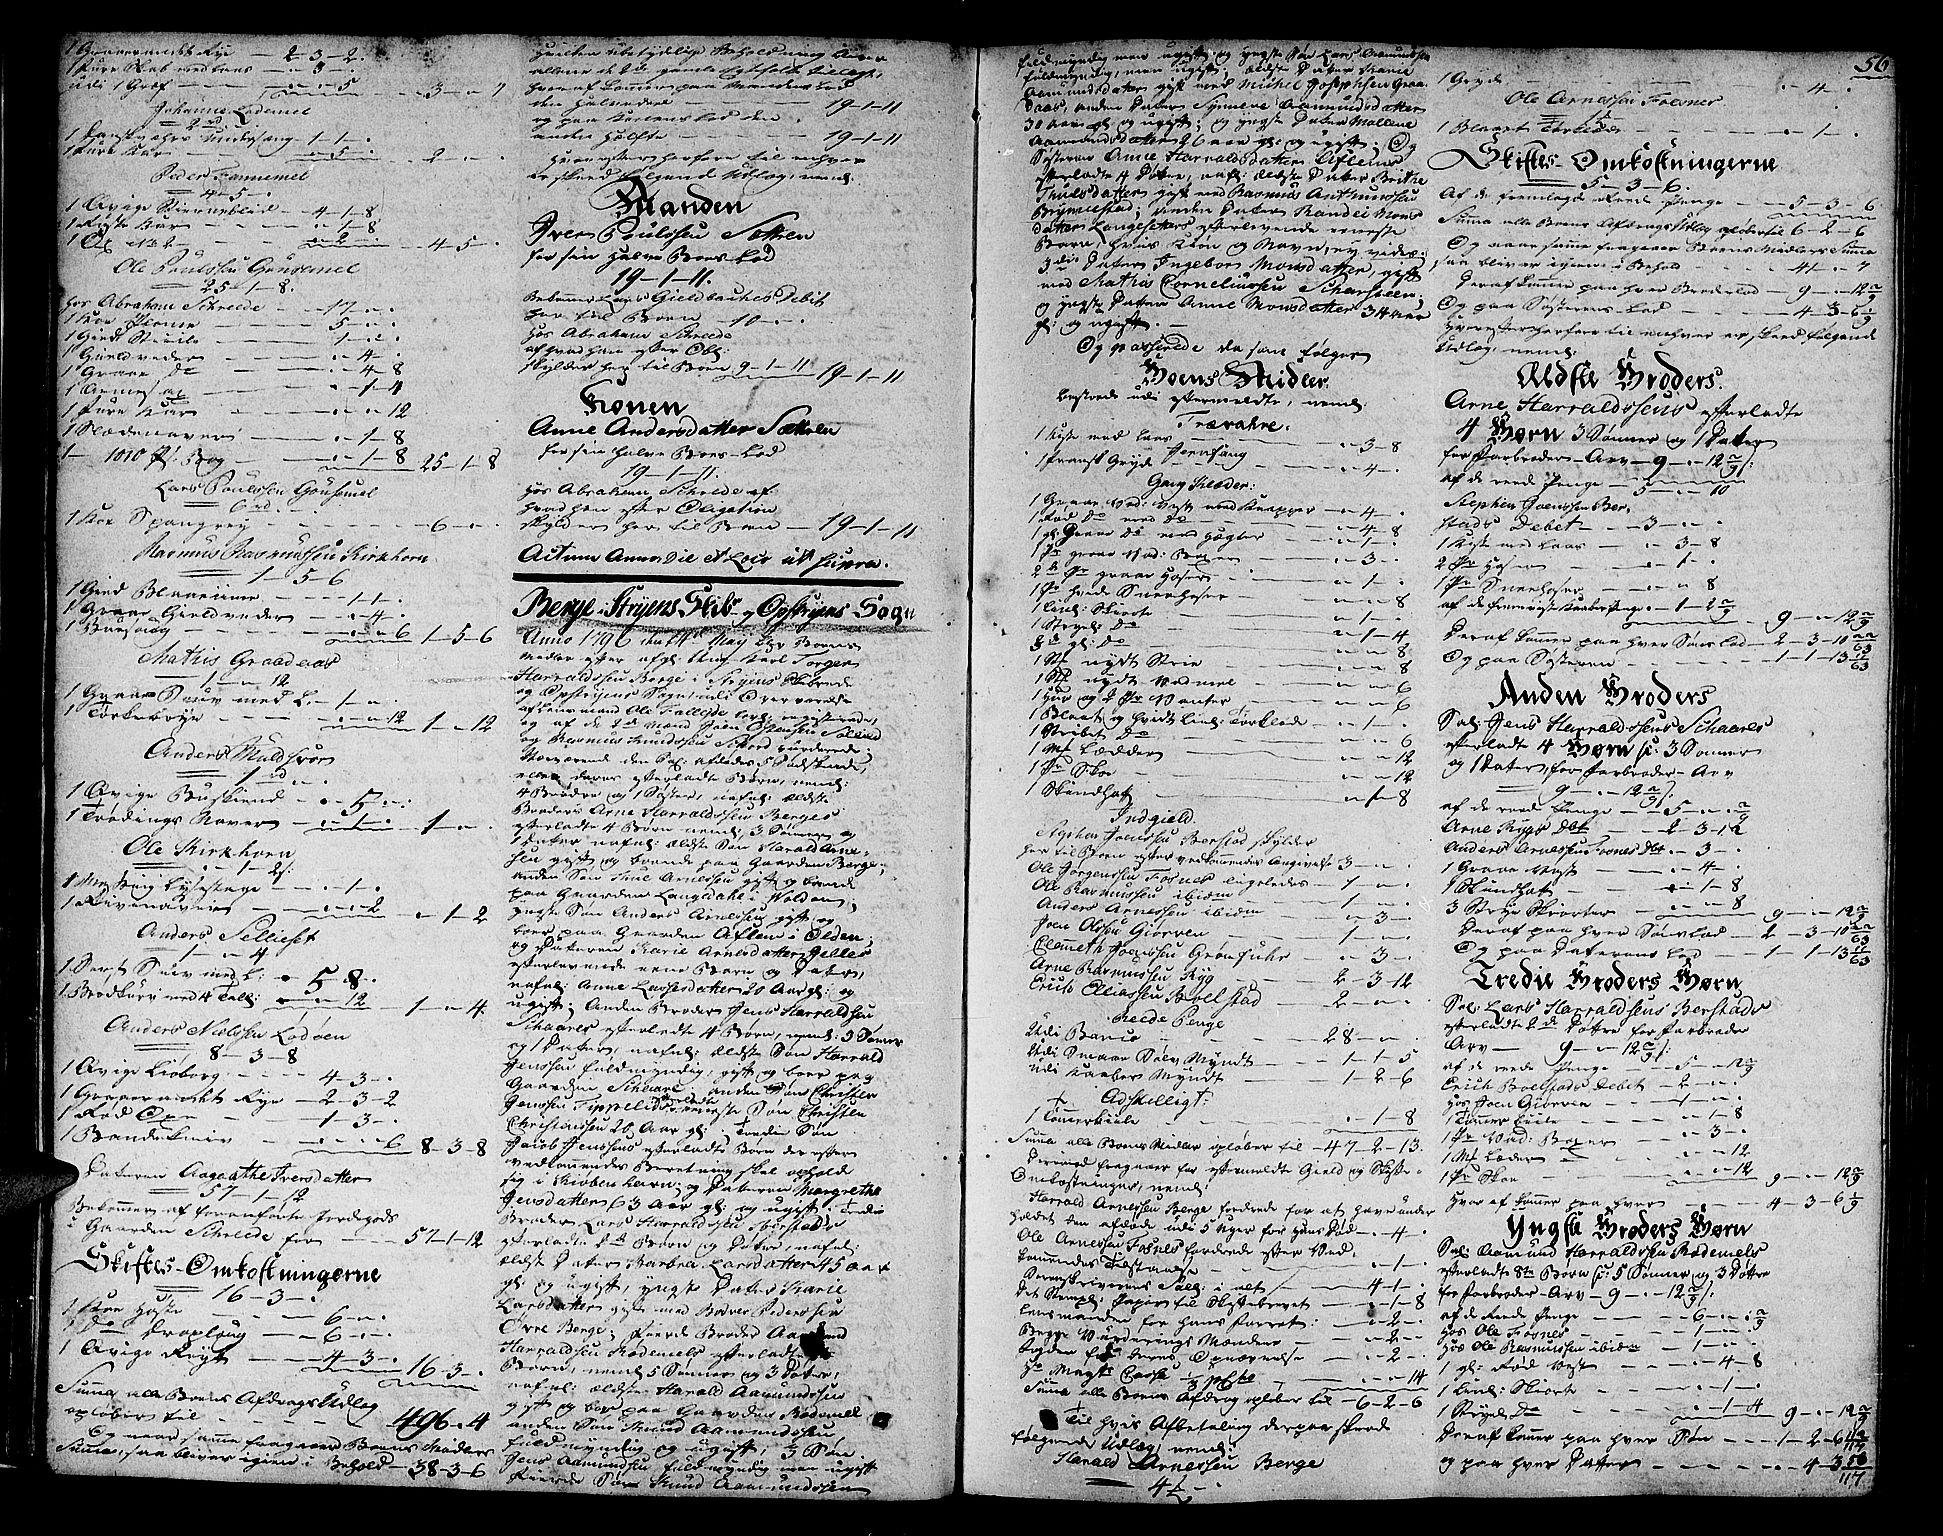 SAB, Nordfjord Sorenskriveri, 04/04a/L0020a: Skifteprotokollar, 1795-1799, s. 55b-56a